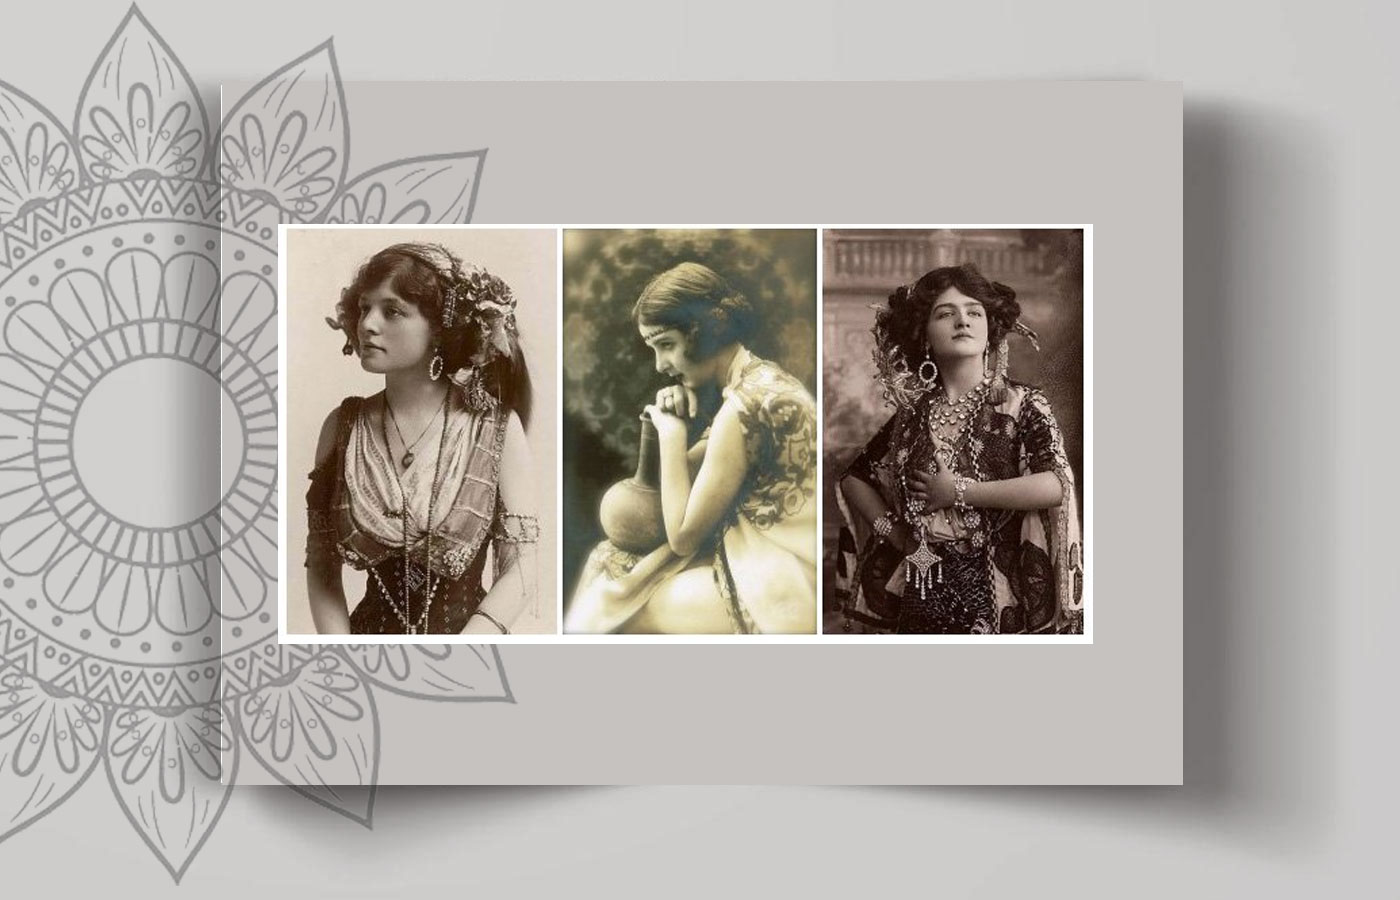 bohemian women style 4 - استایل بوهو زنانه